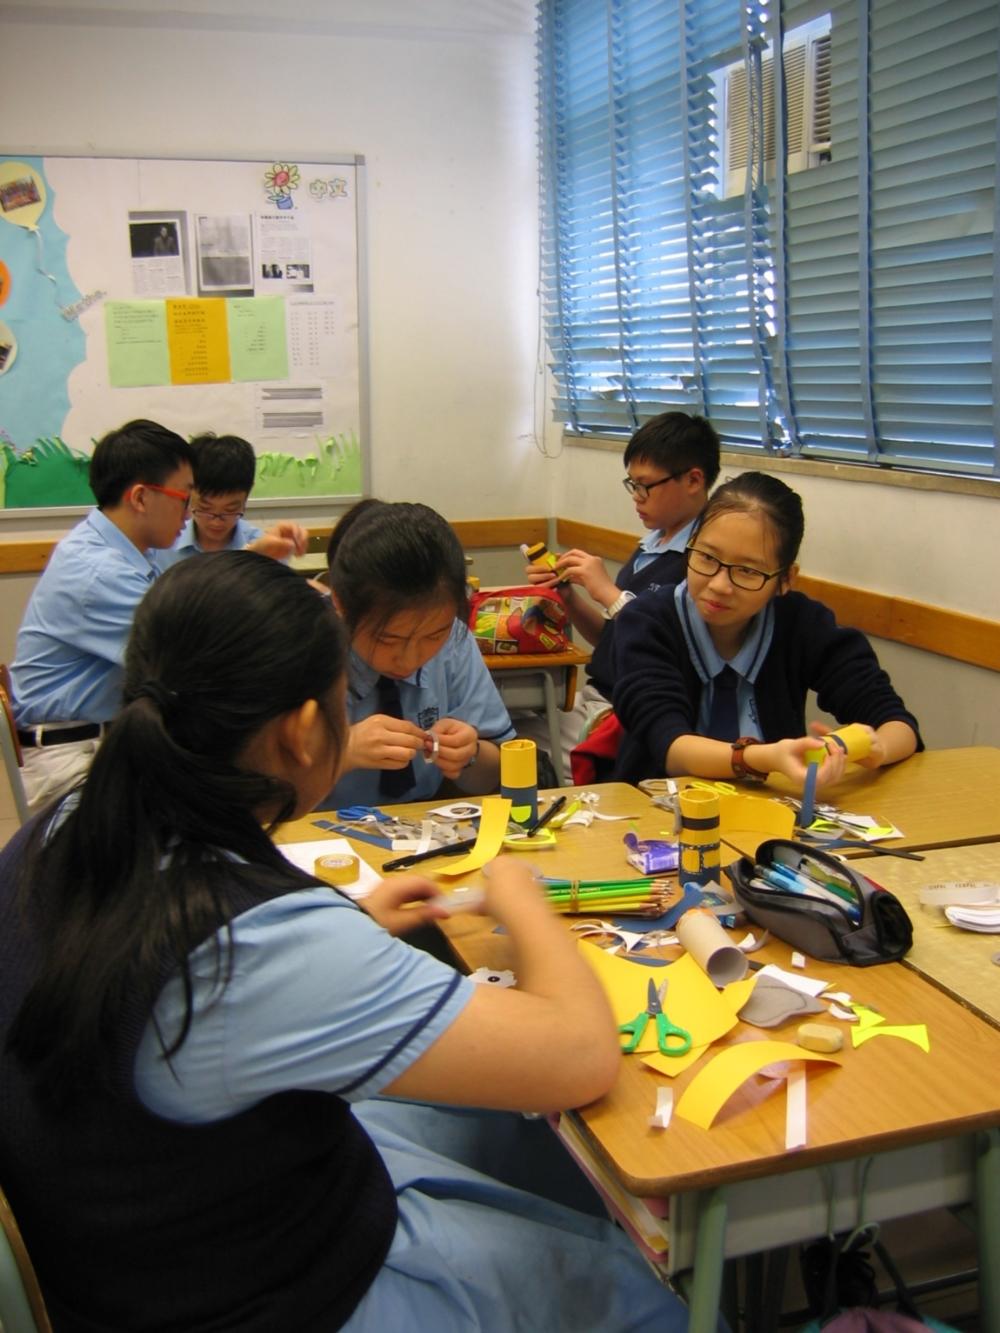 http://www.npc.edu.hk/sites/default/files/5_829.jpg